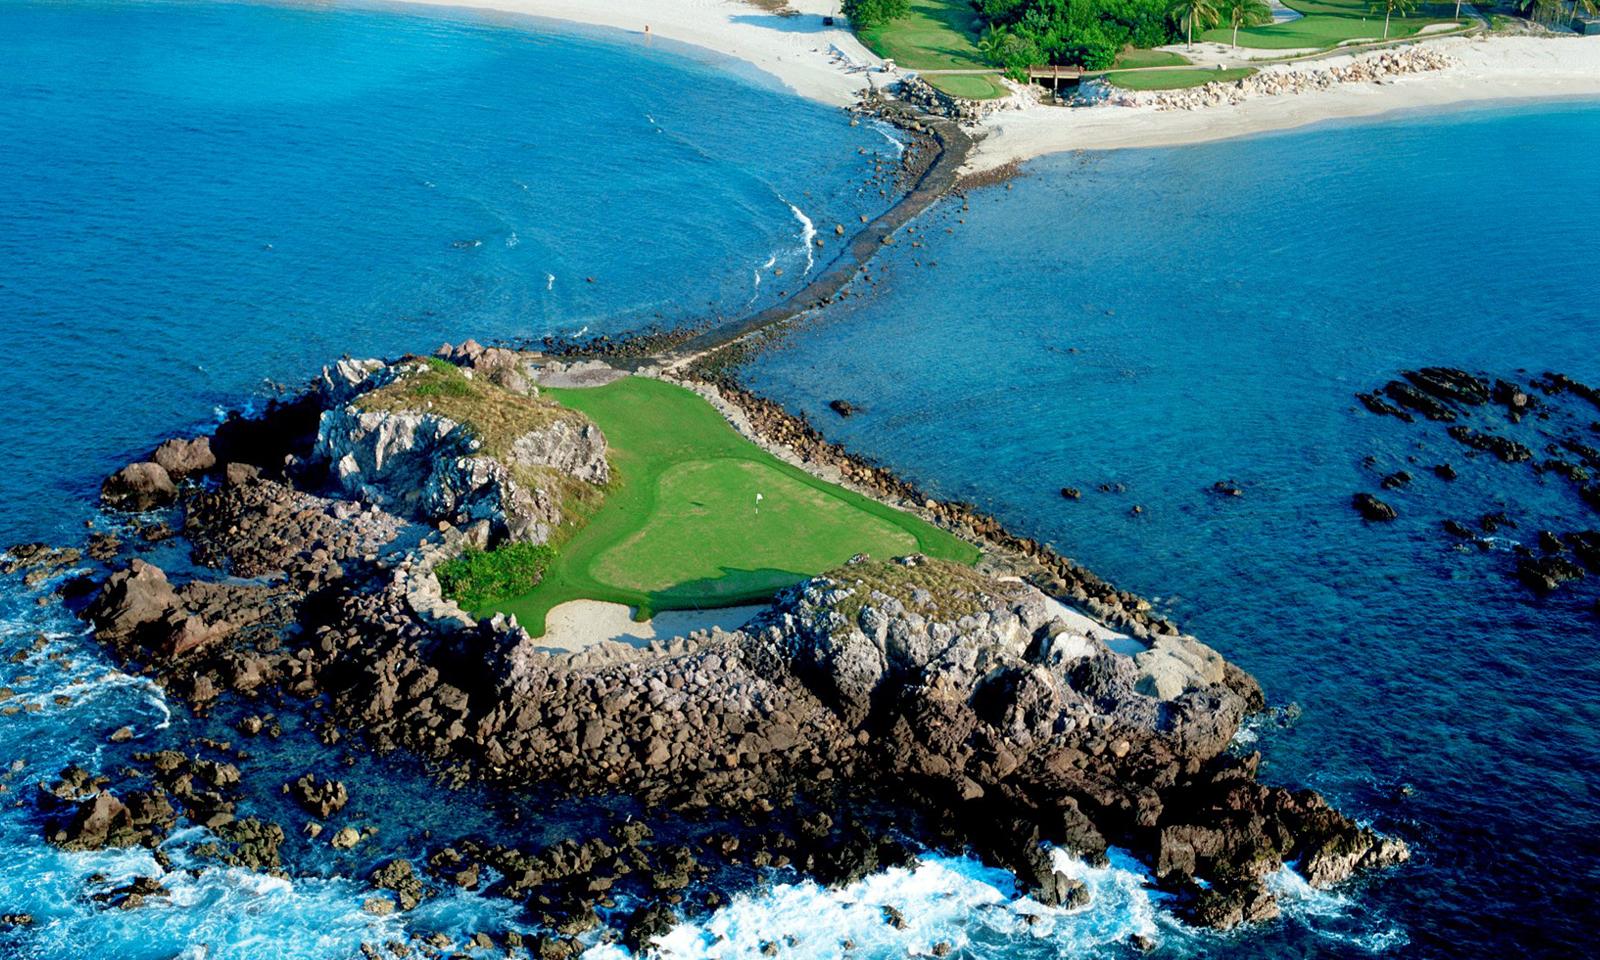 Punta Mita Gourmet & Golf Classic hosted by The St. Regis Punta Mita